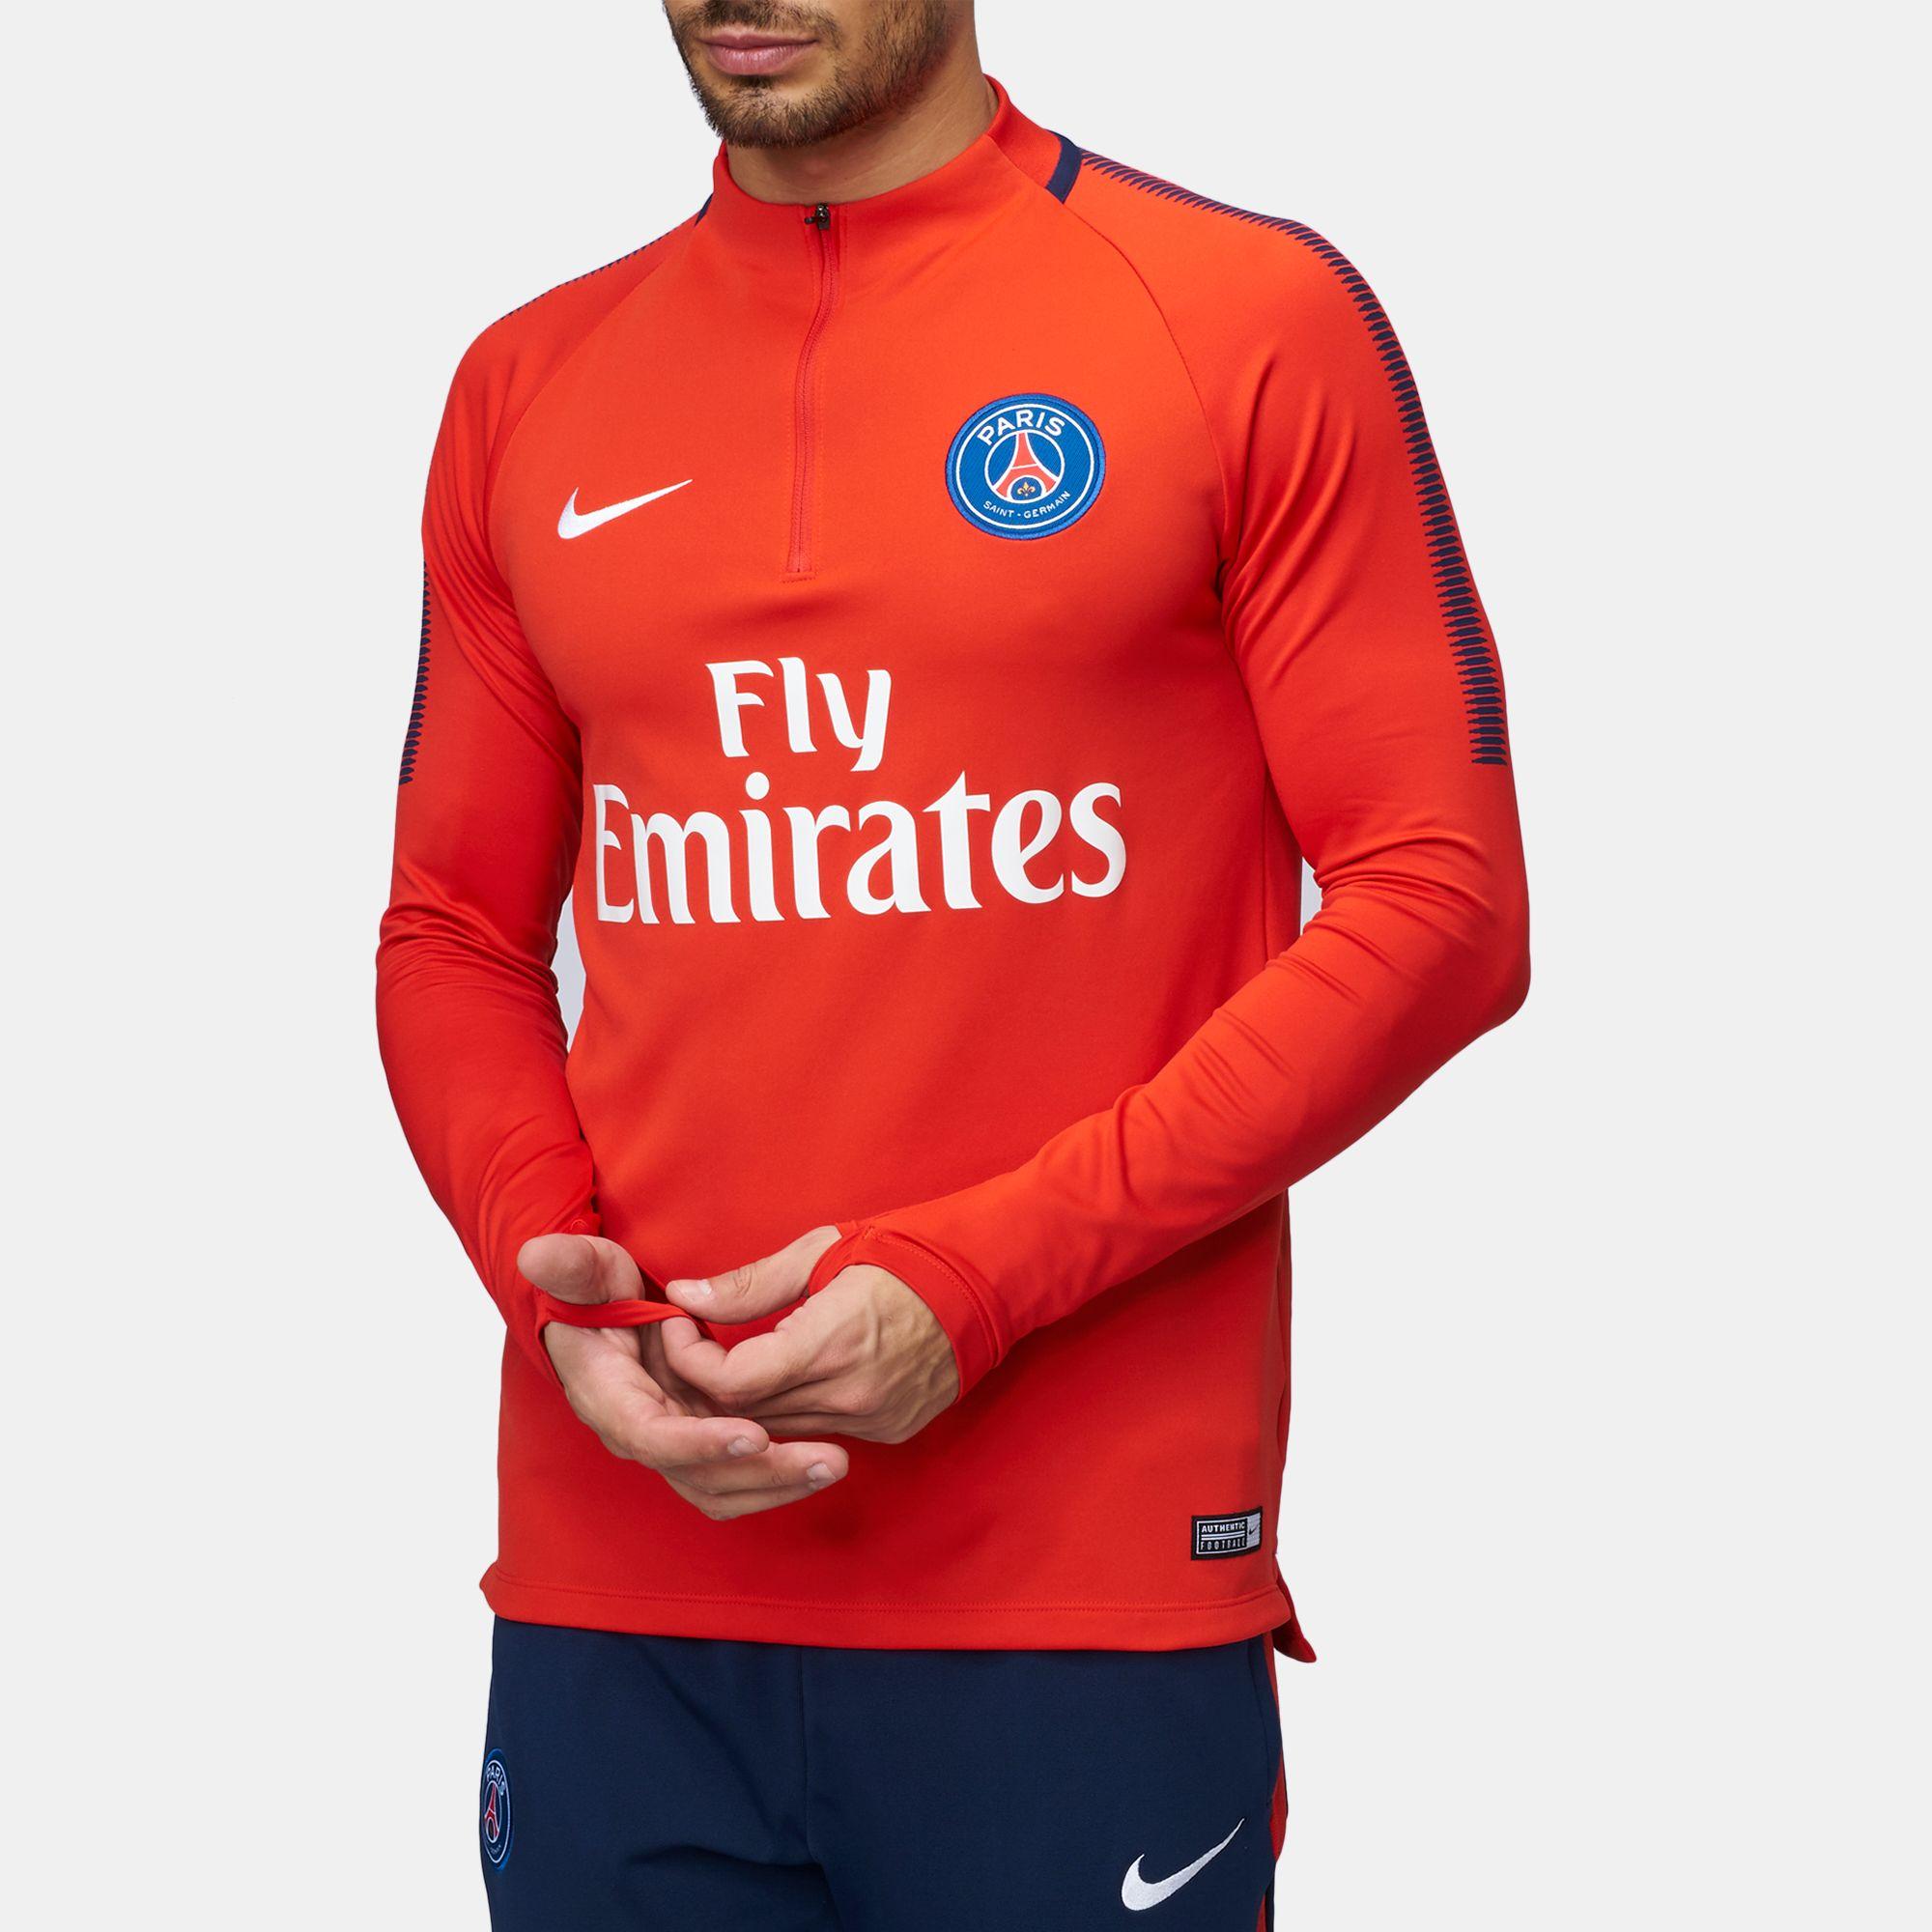 644b52b94 Shop Red Nike Paris Saint-Germain Dry Squad Drill Football ...